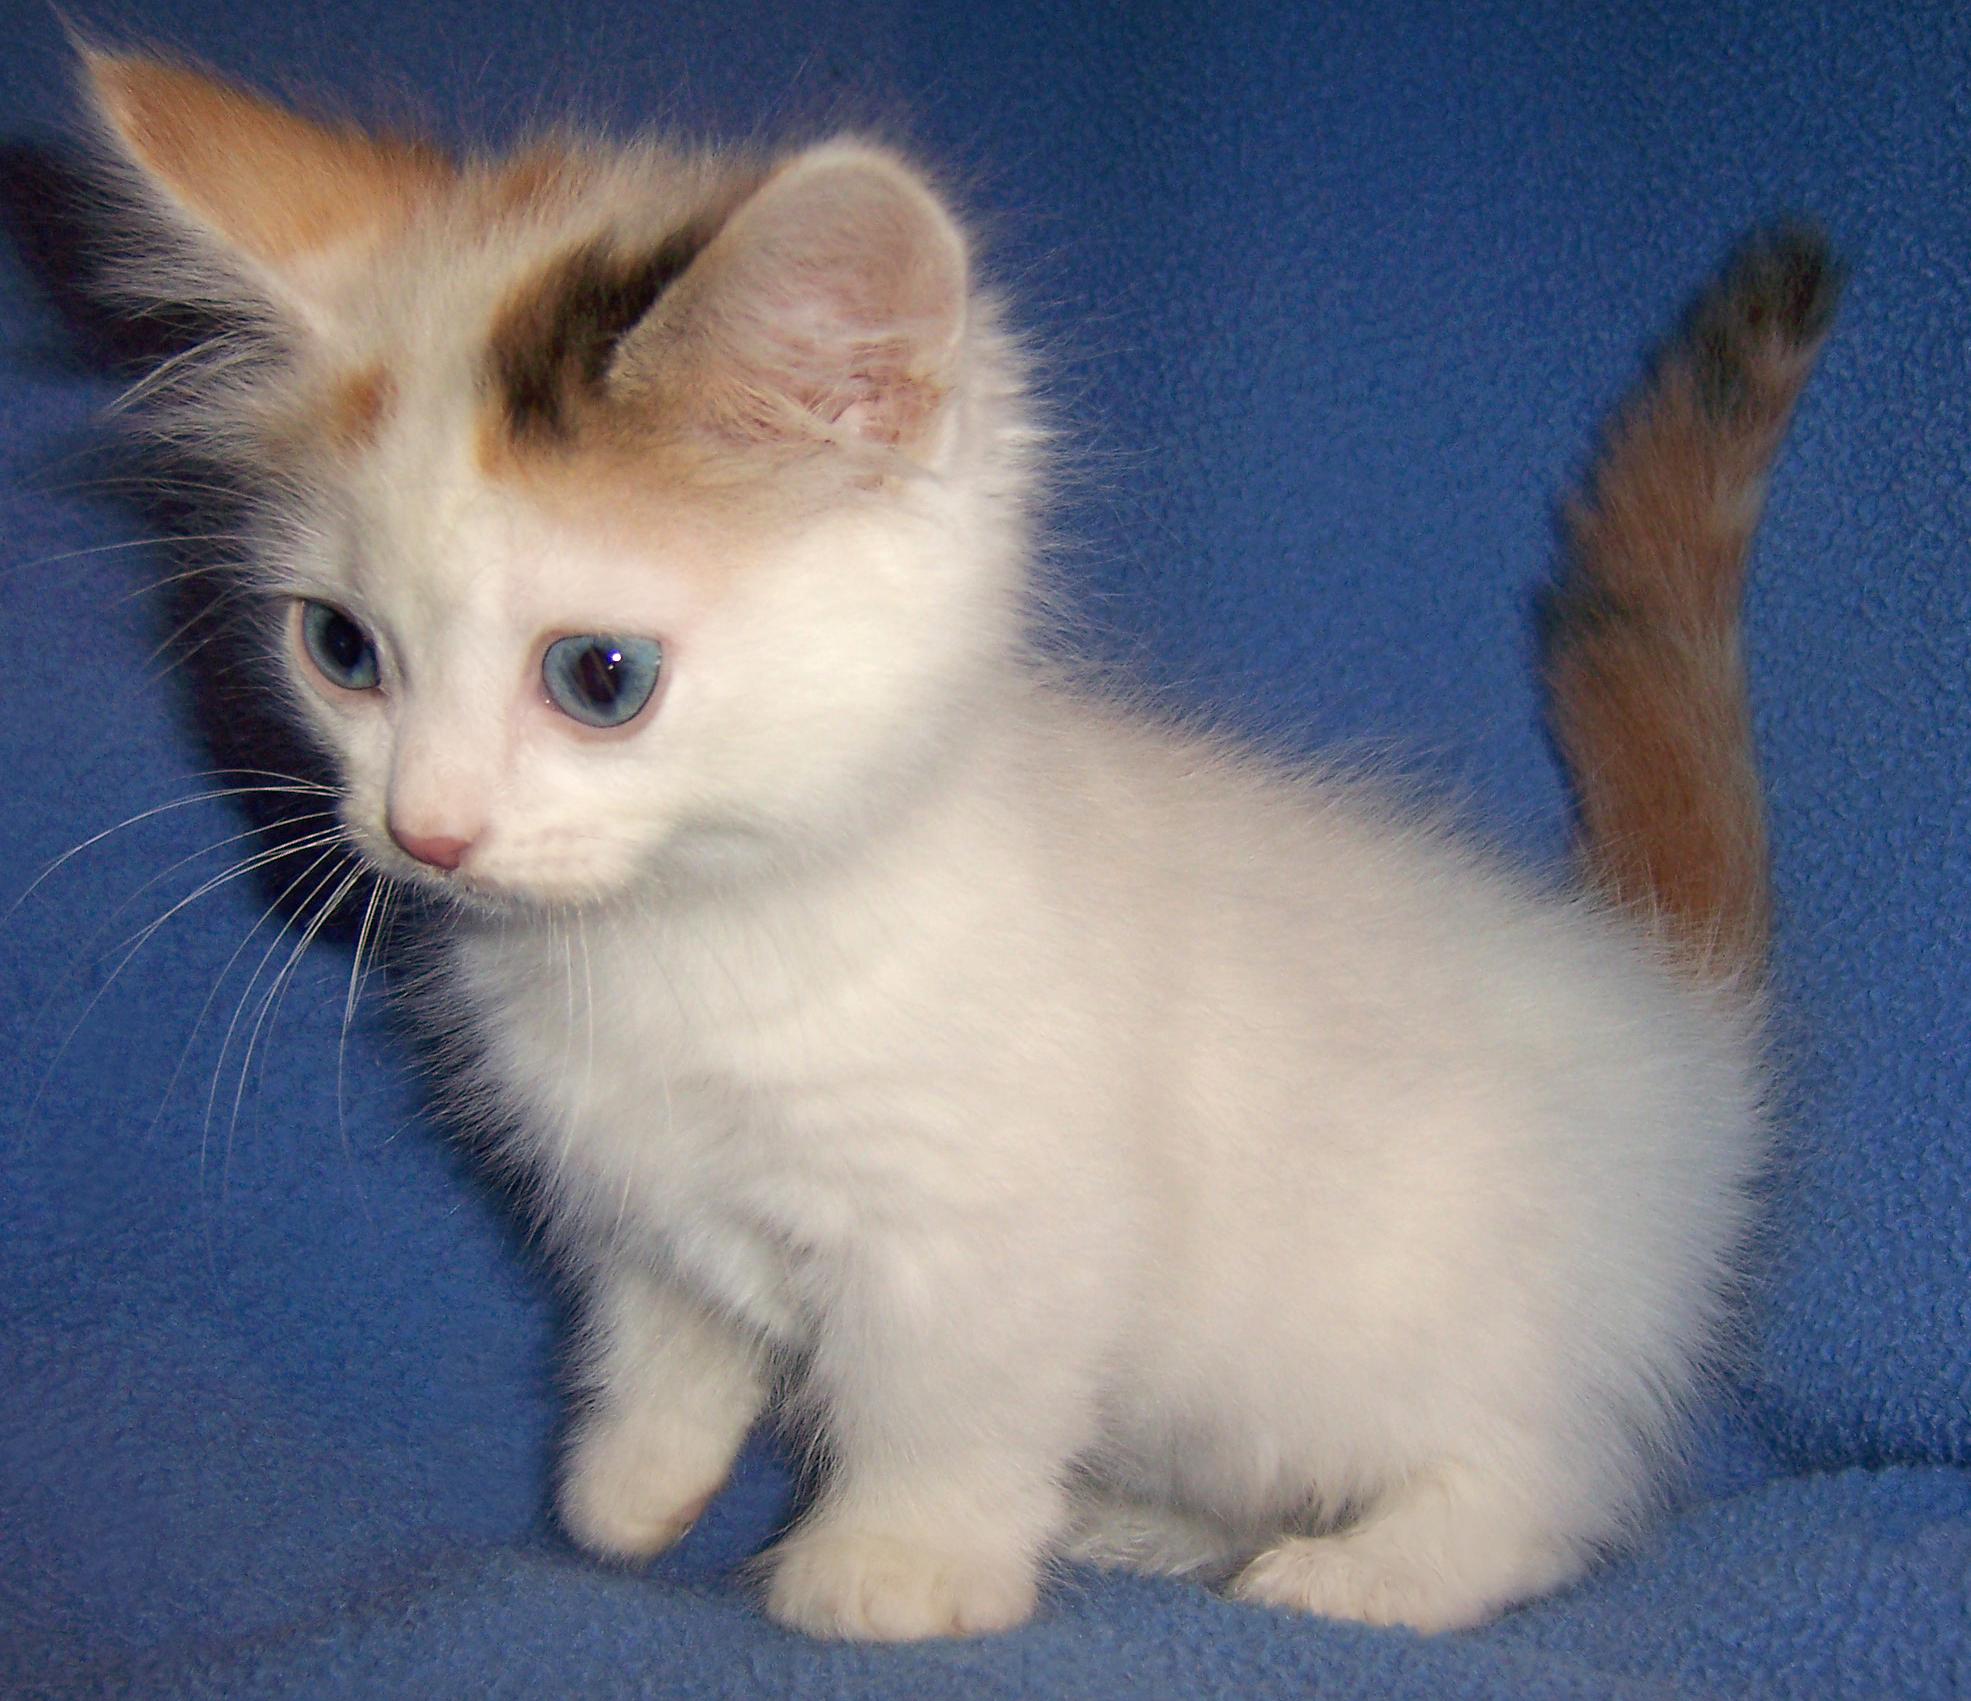 Munchkin Kitten: Munchkin Munchkin Cat History Characteristics And Temperament Breed